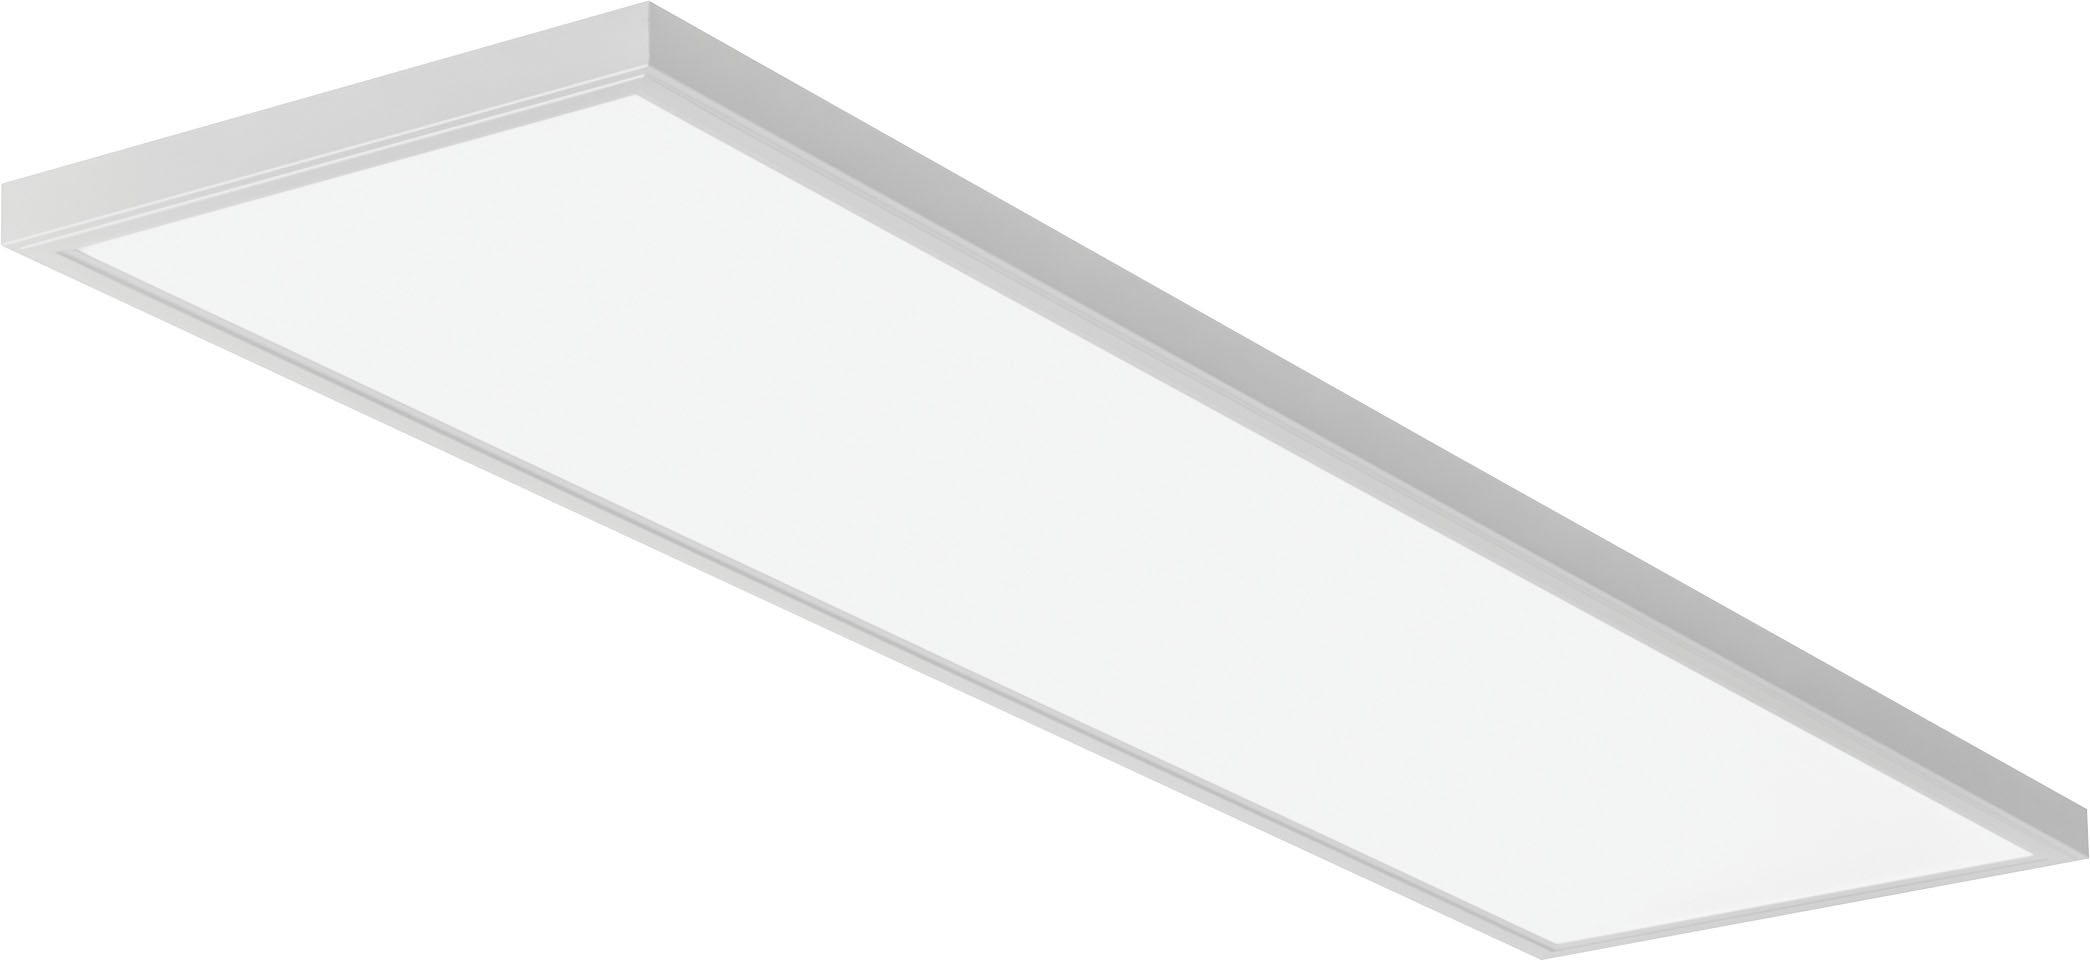 CPANL 1X4_Illuminated